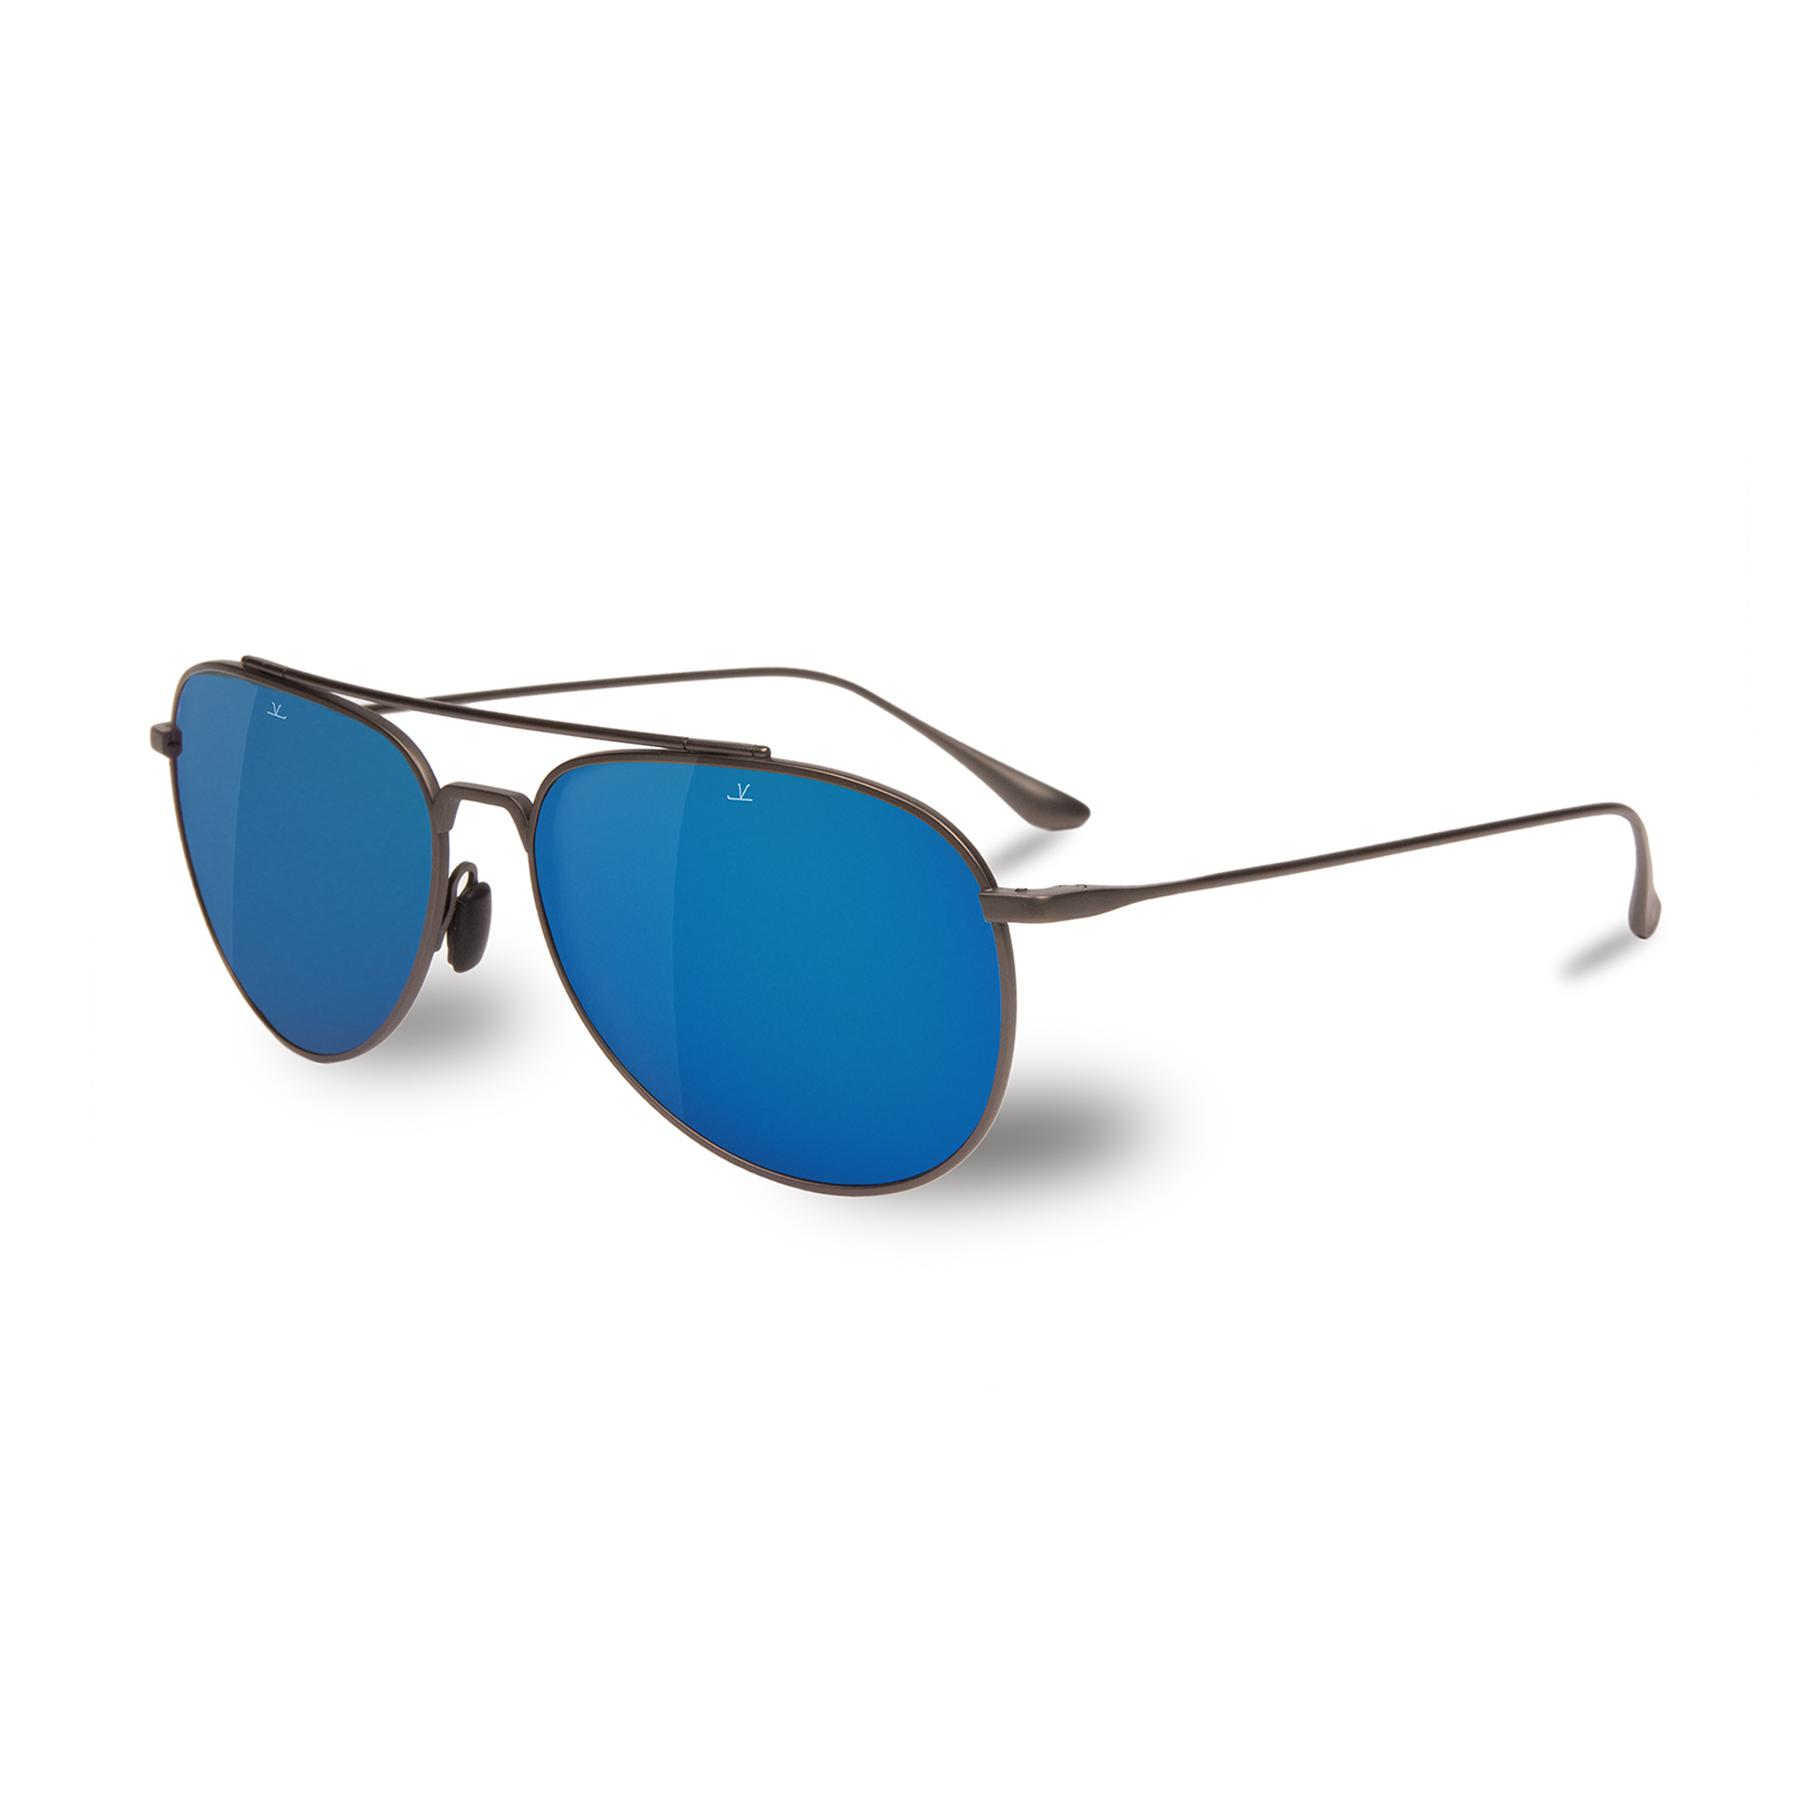 e70786591f Vuarnet - Men Polarized Sunglasses Aviator Pilot Titanium Blue Flash for Men  - Lyst. View fullscreen